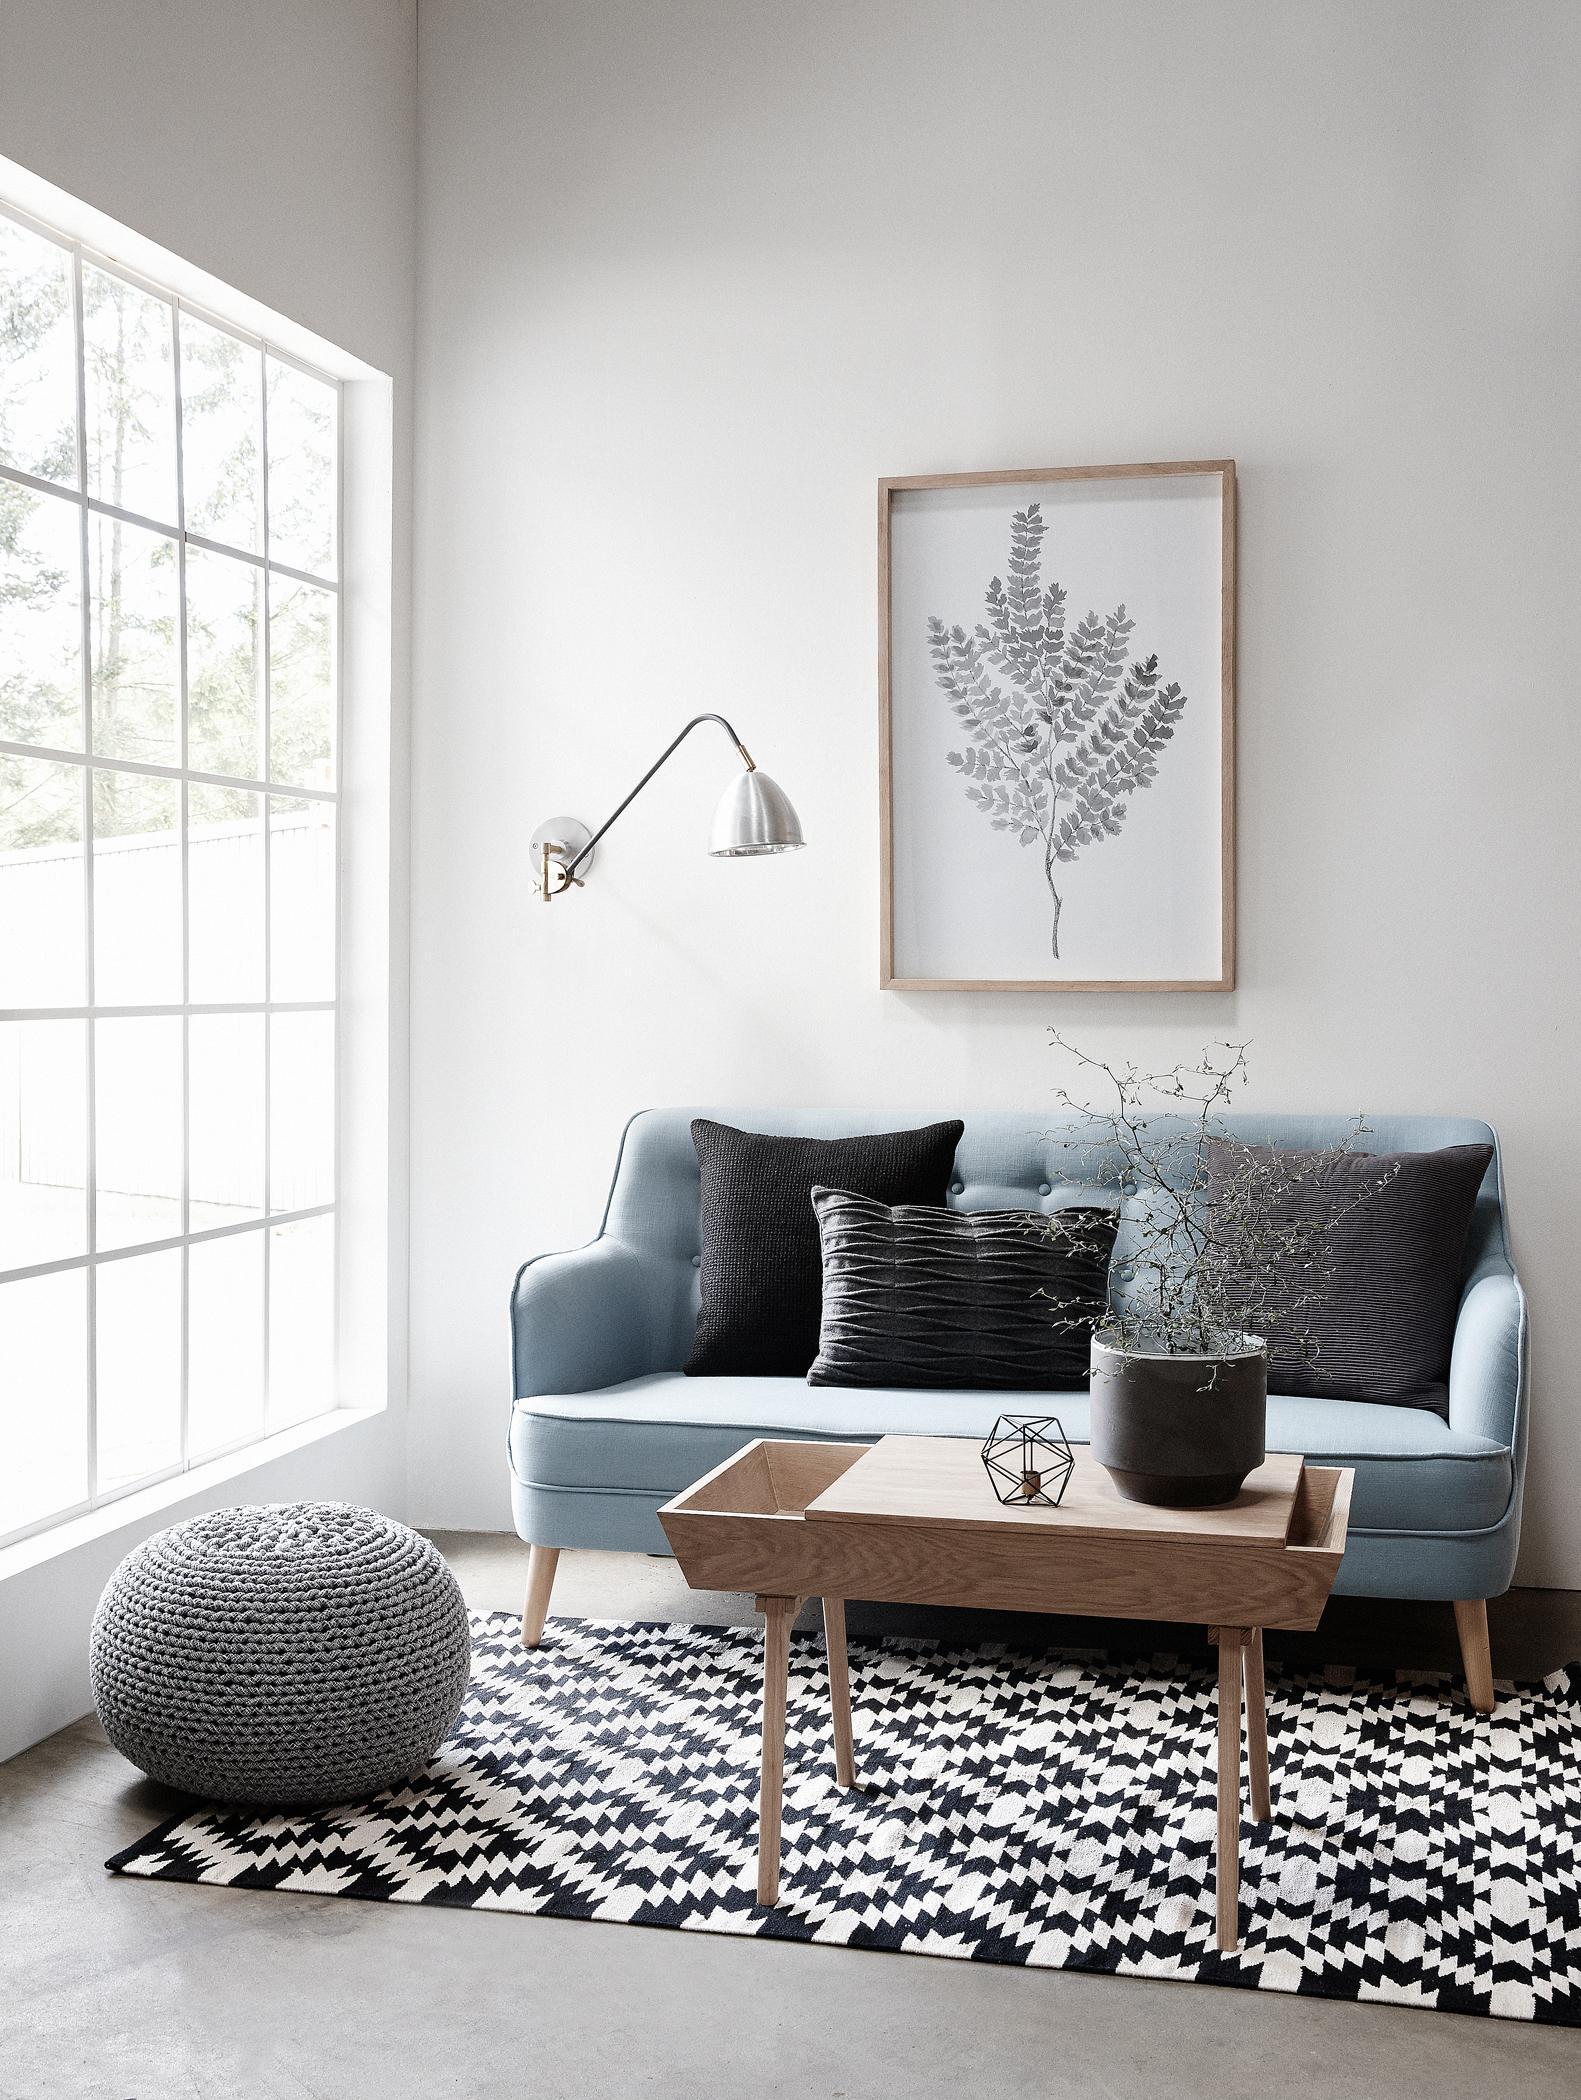 Blaues Sofa • Bilder & Ideen • COUCHstyle